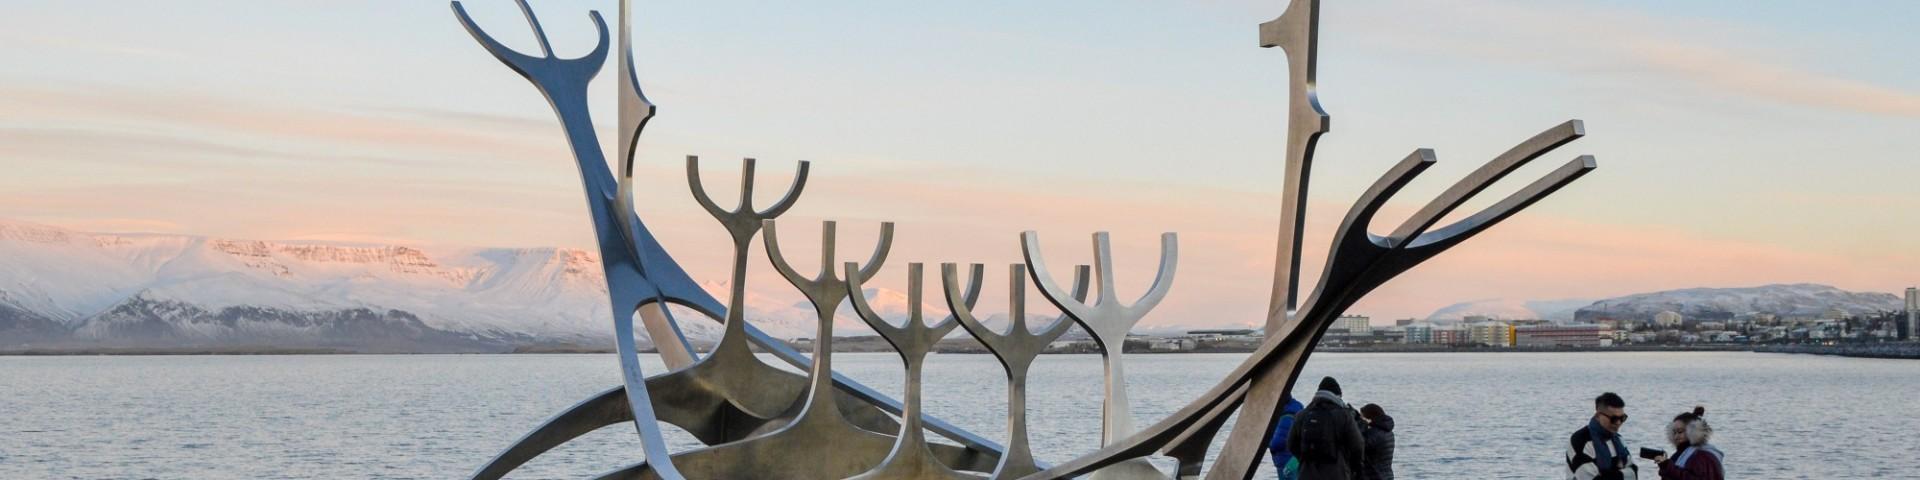 The Sun Voyager Viking Boat Sculpture, Reykjavik